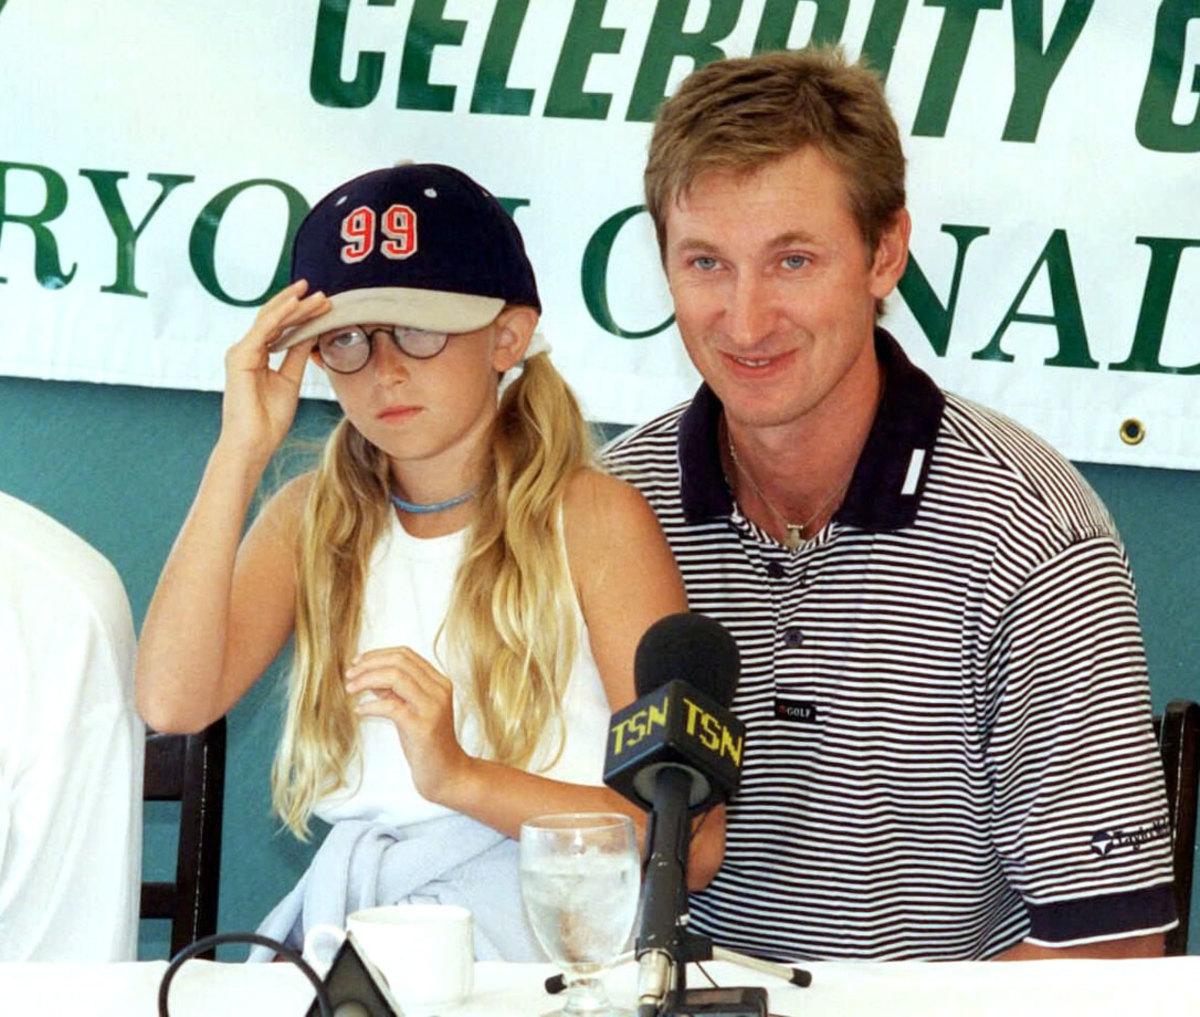 Wayne-Gretzky-daughter-Paulina.jpg